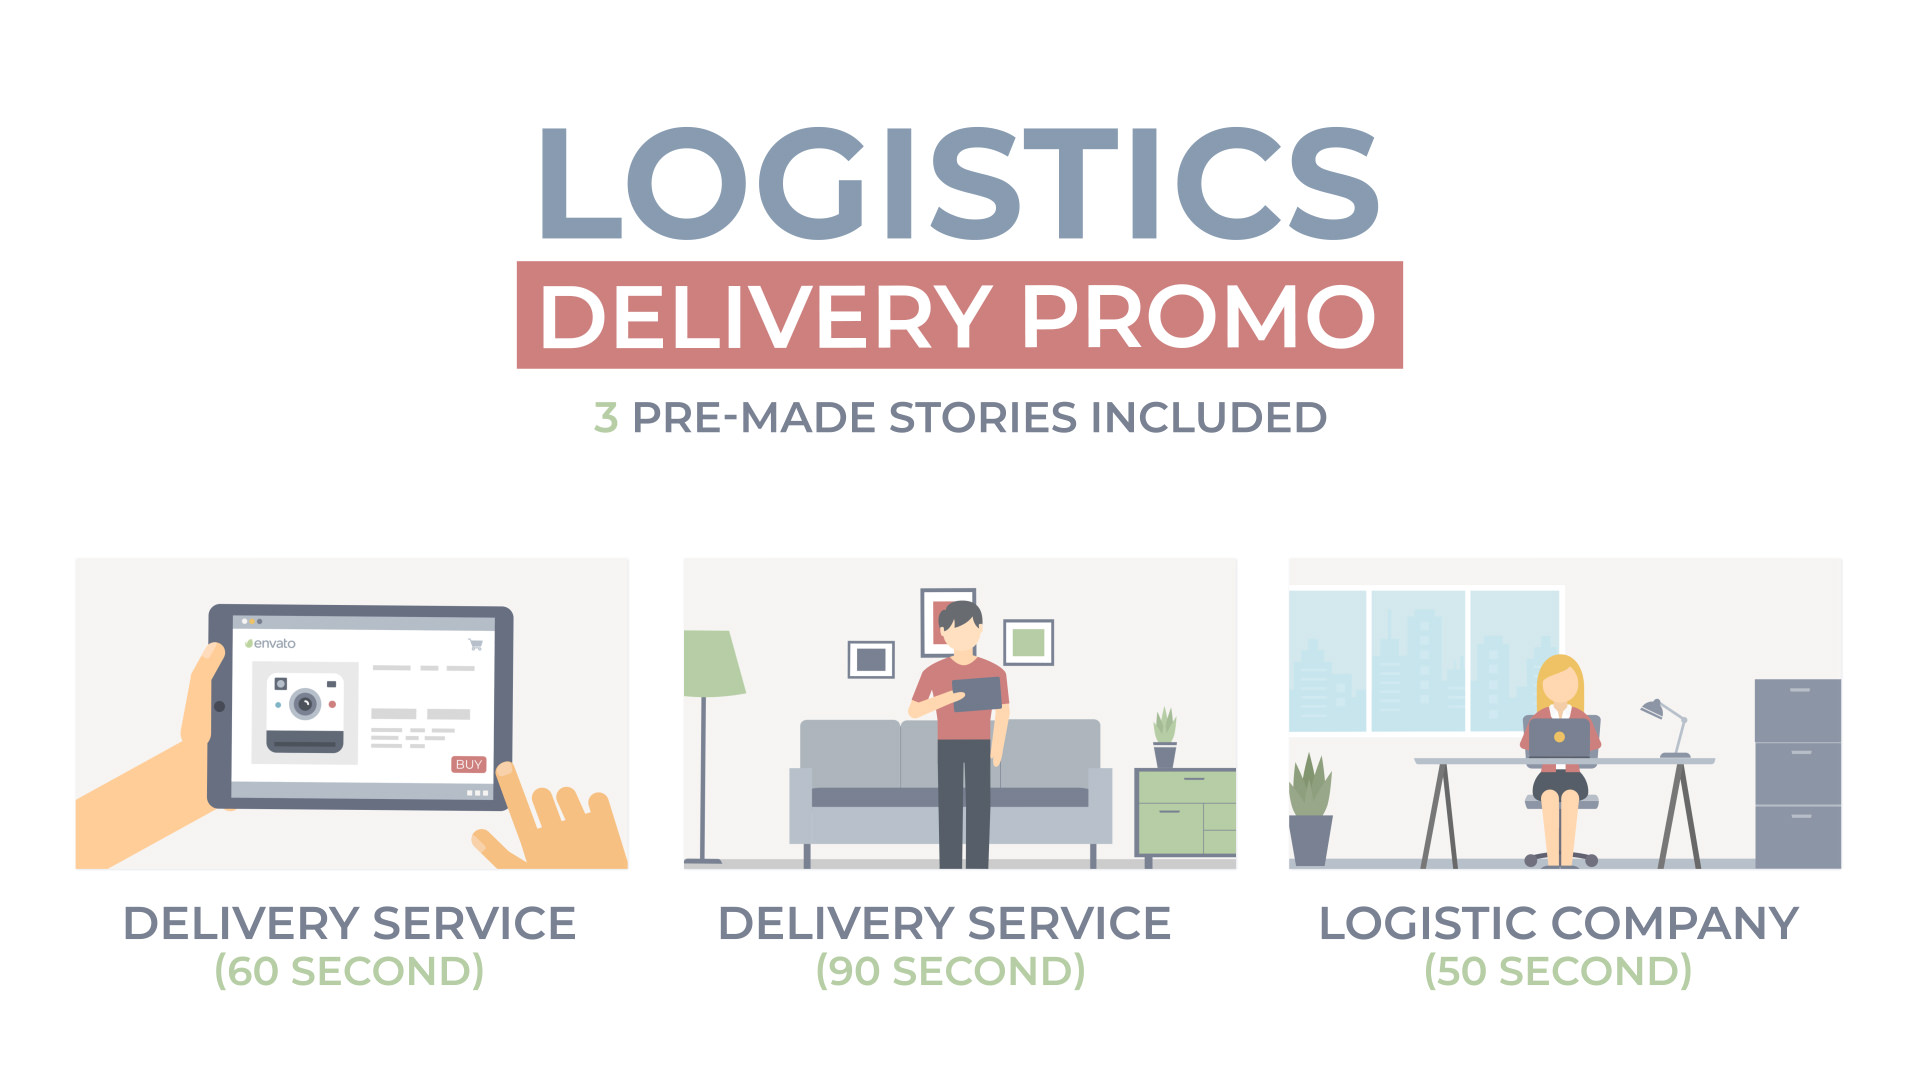 Logistics Delivery Promo - 2